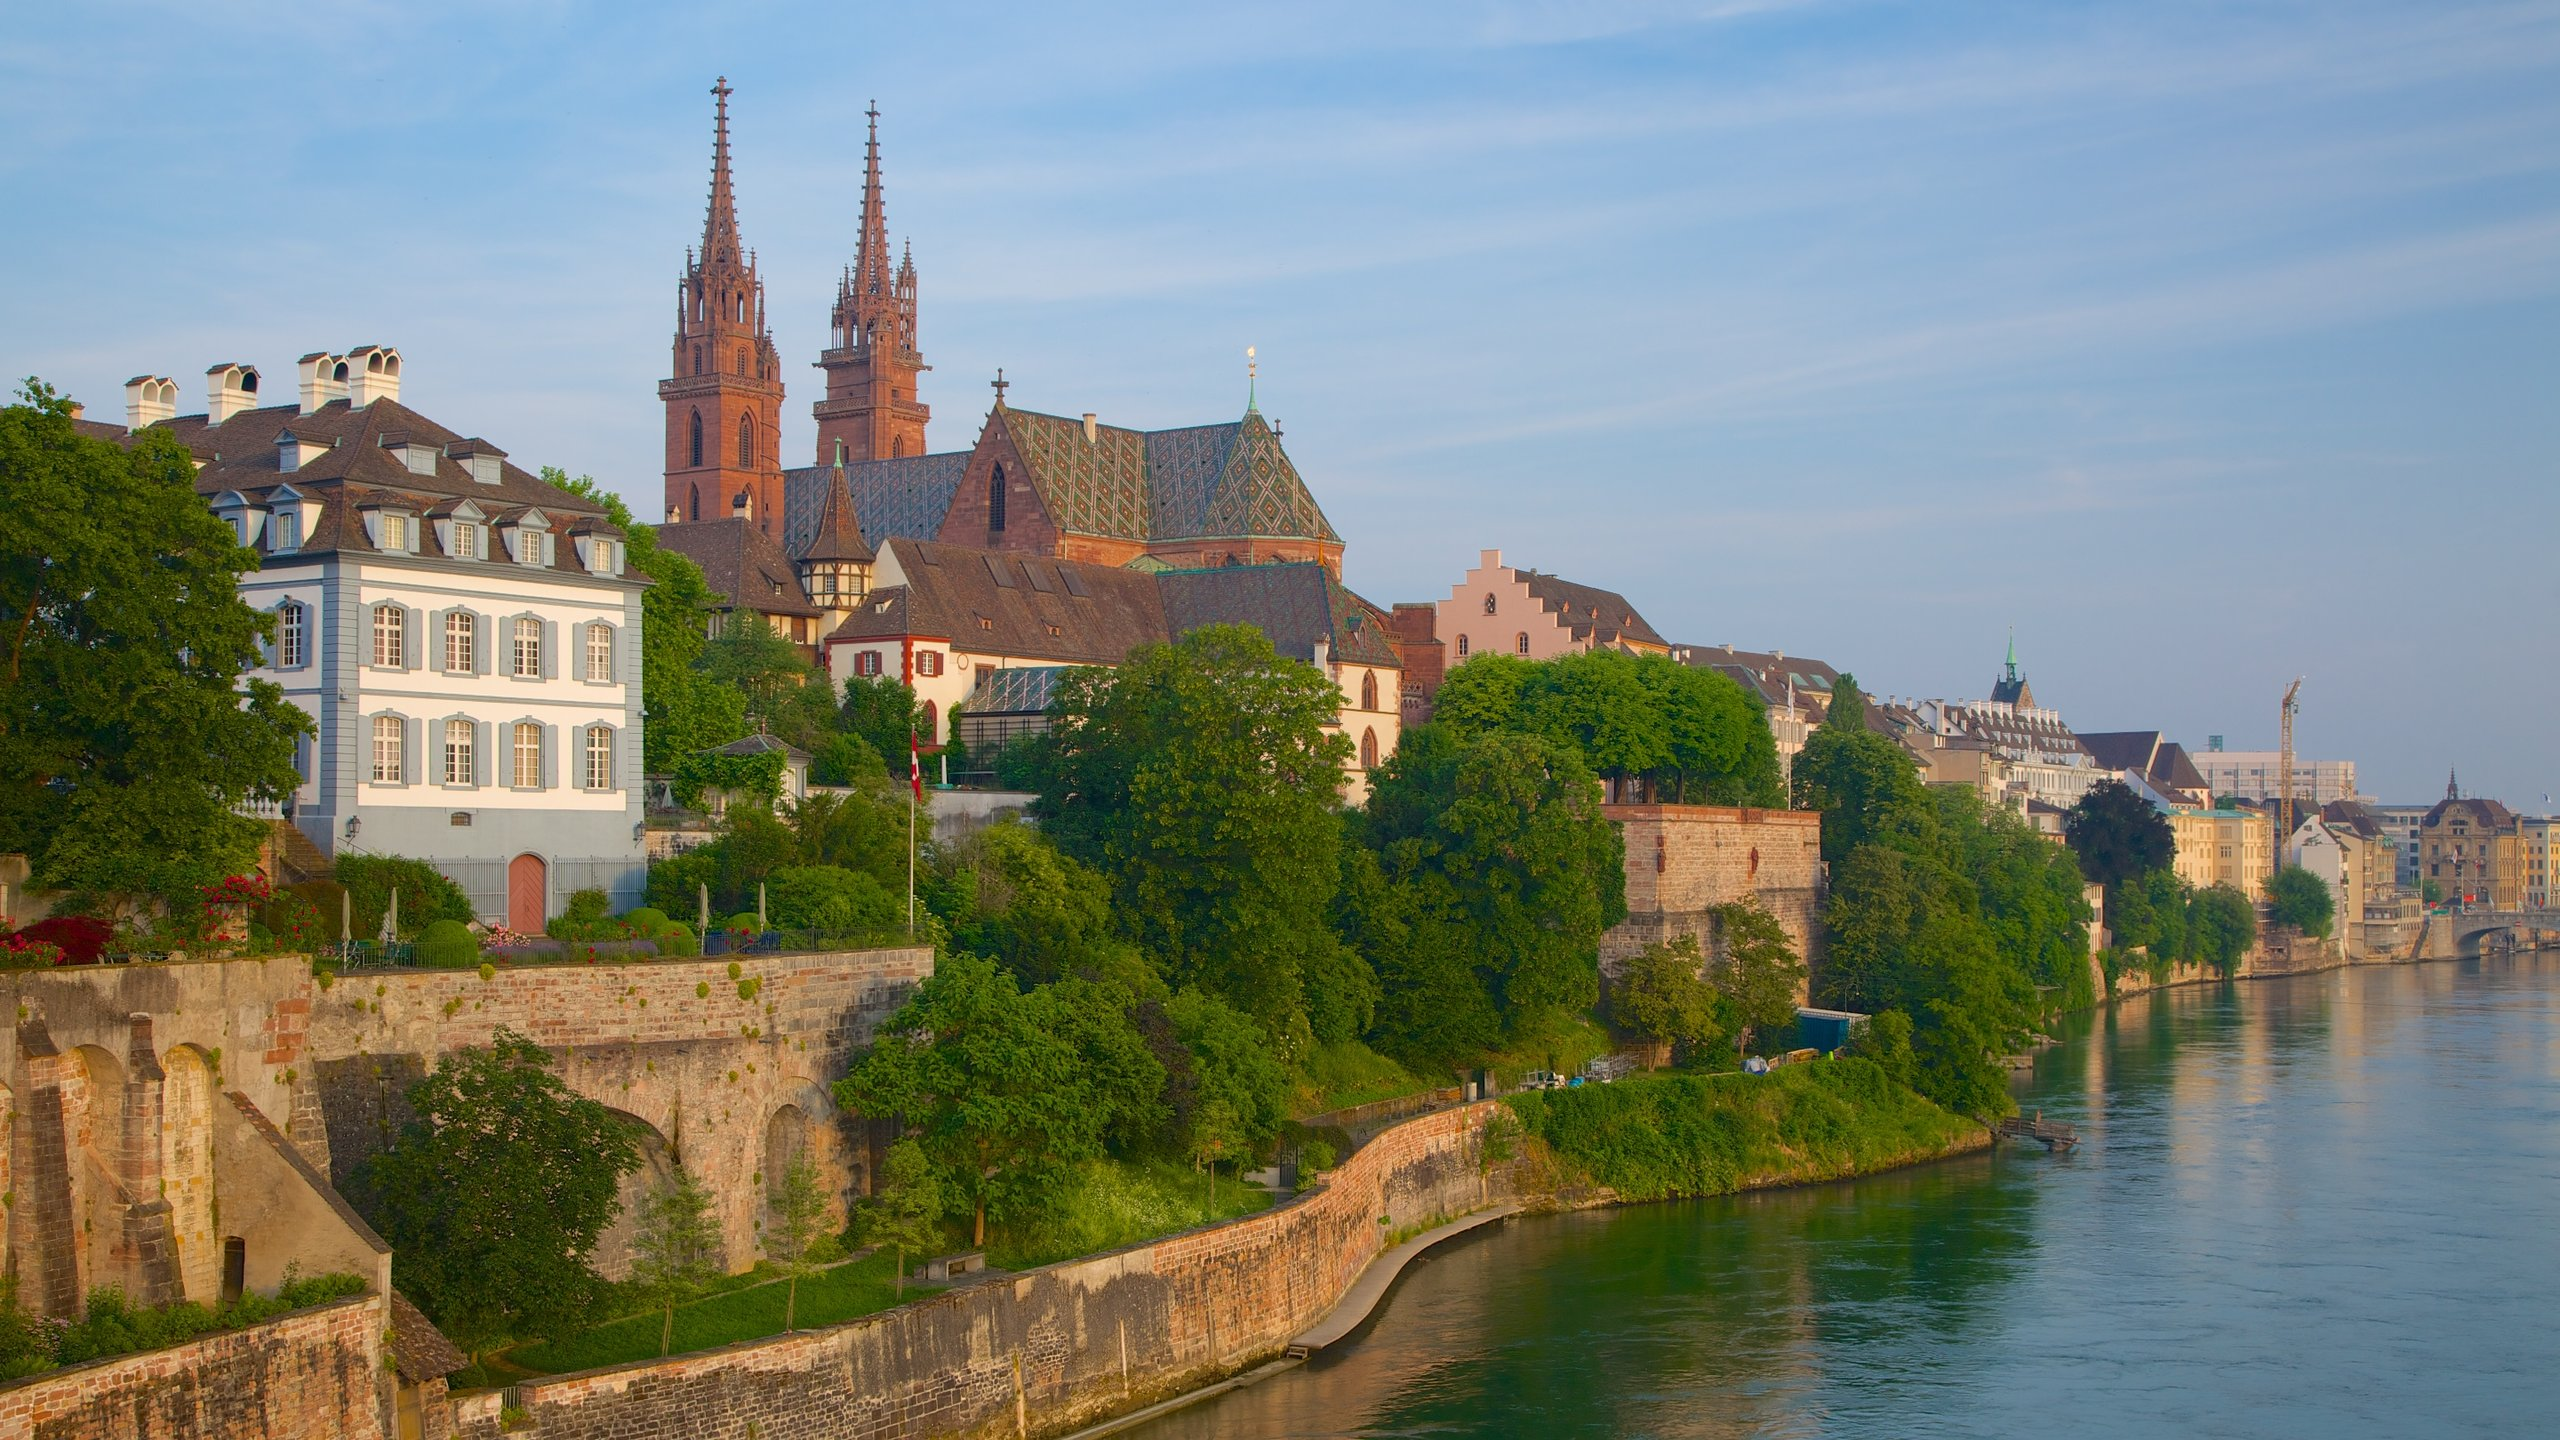 Basler Muenster, Basel, Basel-Stadt, Switzerland